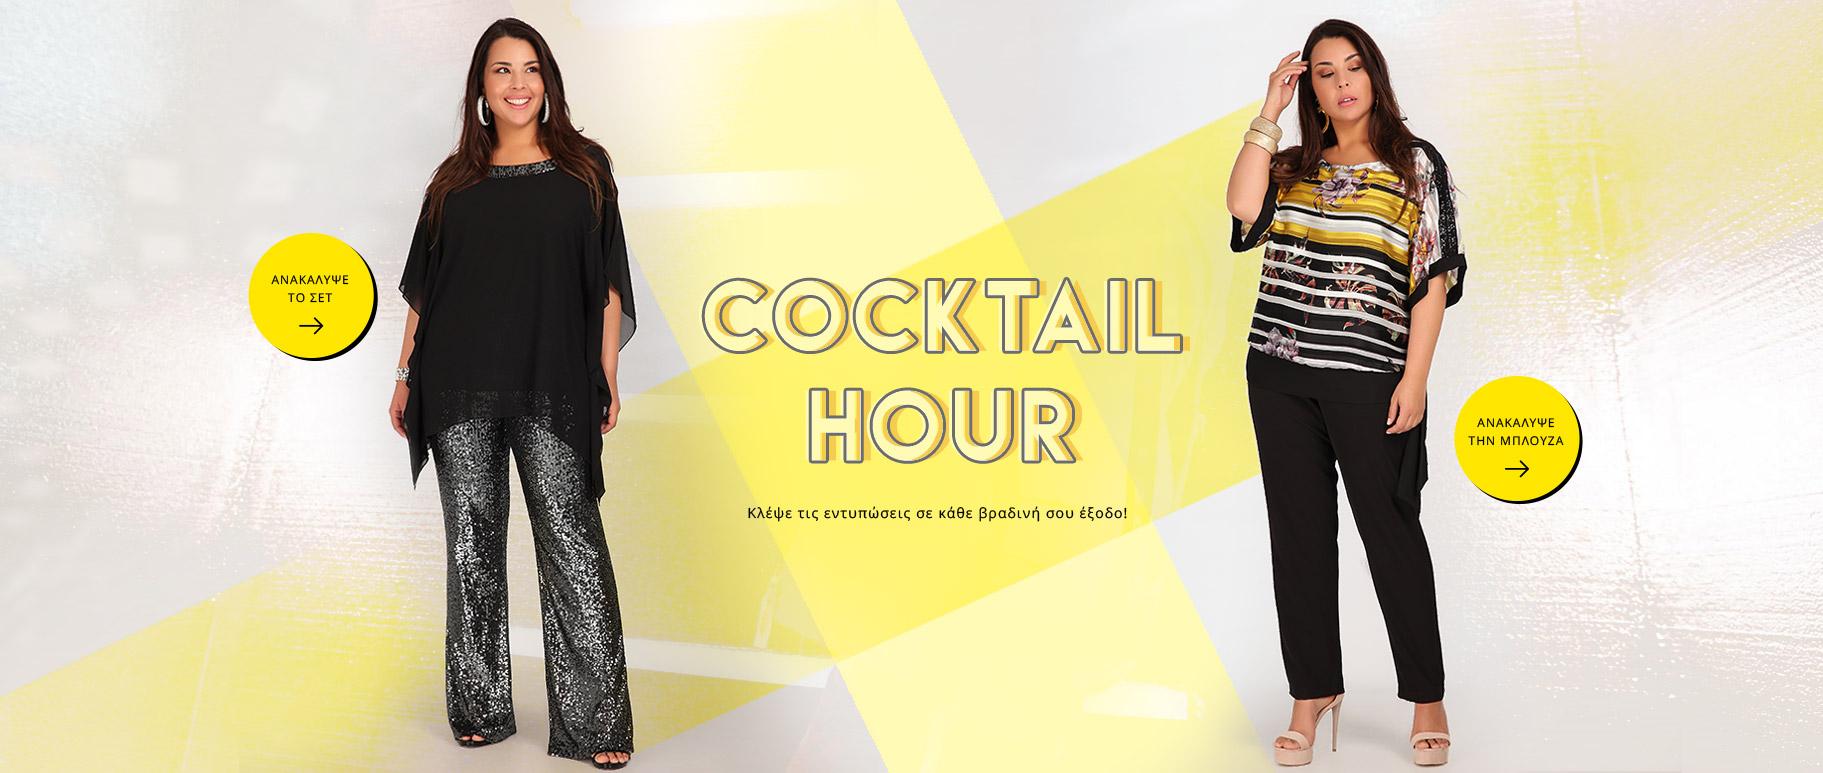 bee364879fb Ανακαλύψτε την πλούσια και ενημερωμένη συλλογή με κομψά και κολακευτικά  ρούχα για υπέροχες εμφανίσεις!